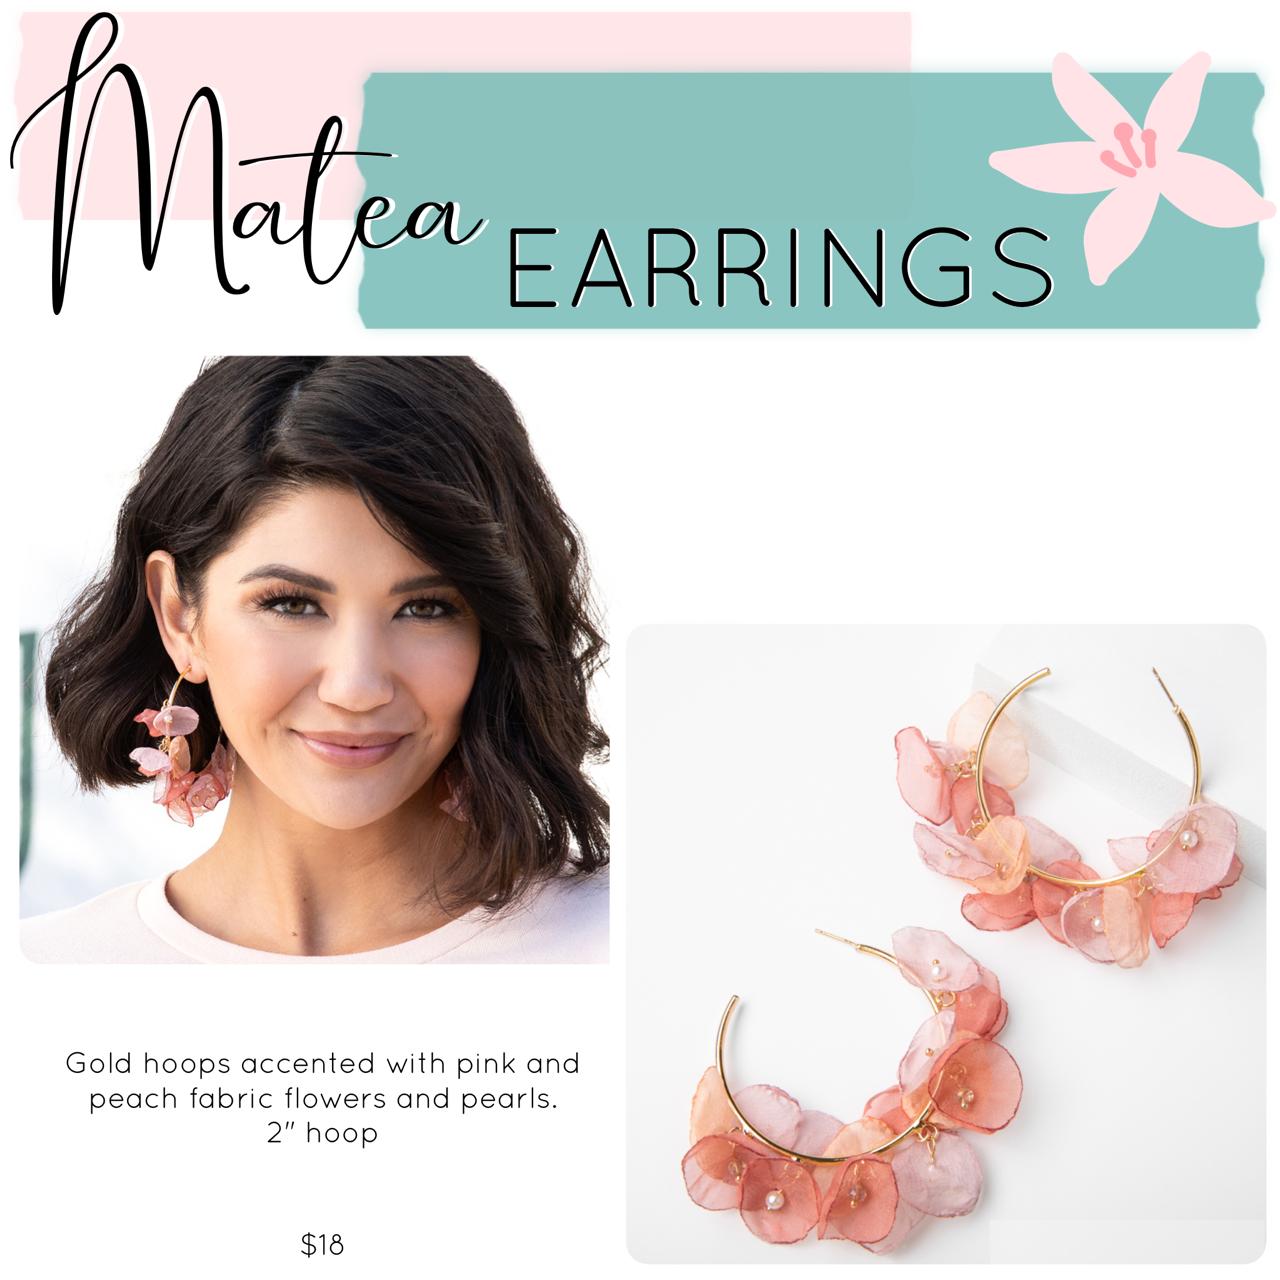 Mother's Day Jewelry Drop – Matea Earrings